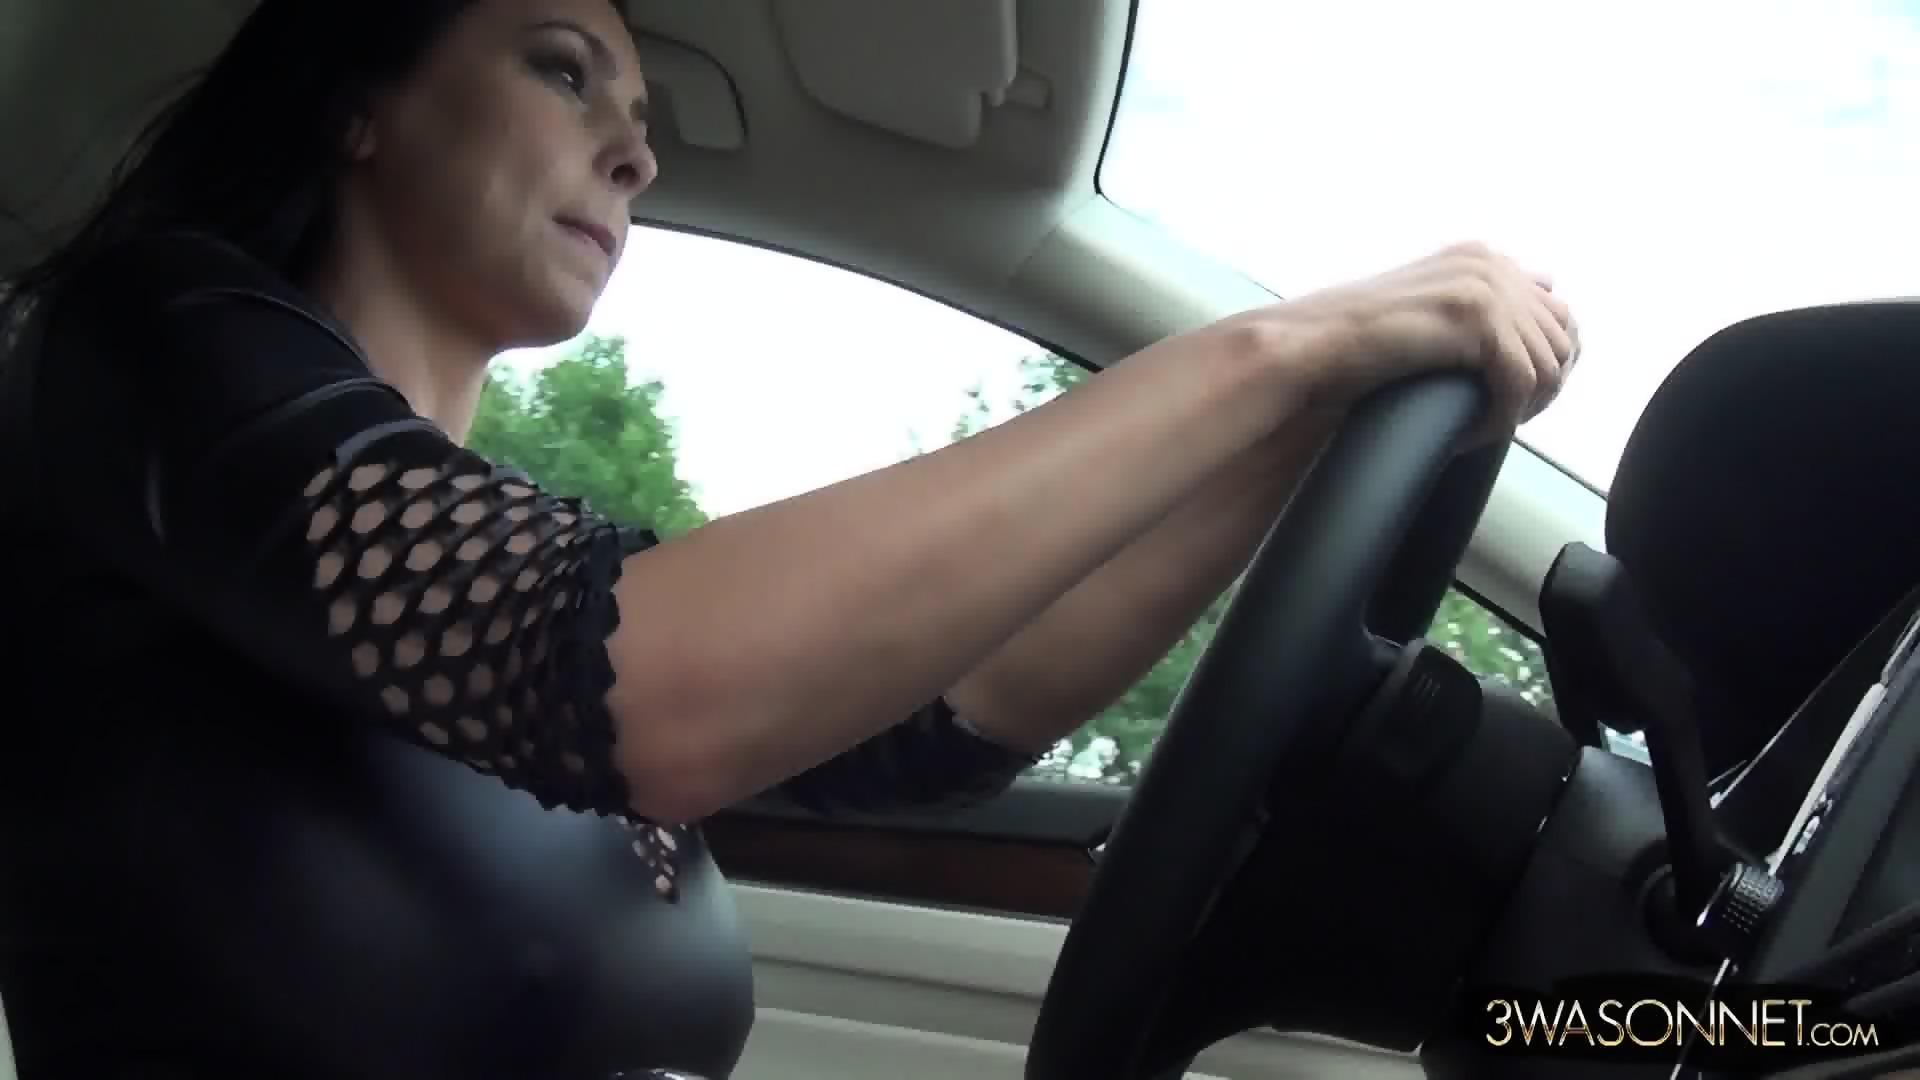 huge tits in car - eporner